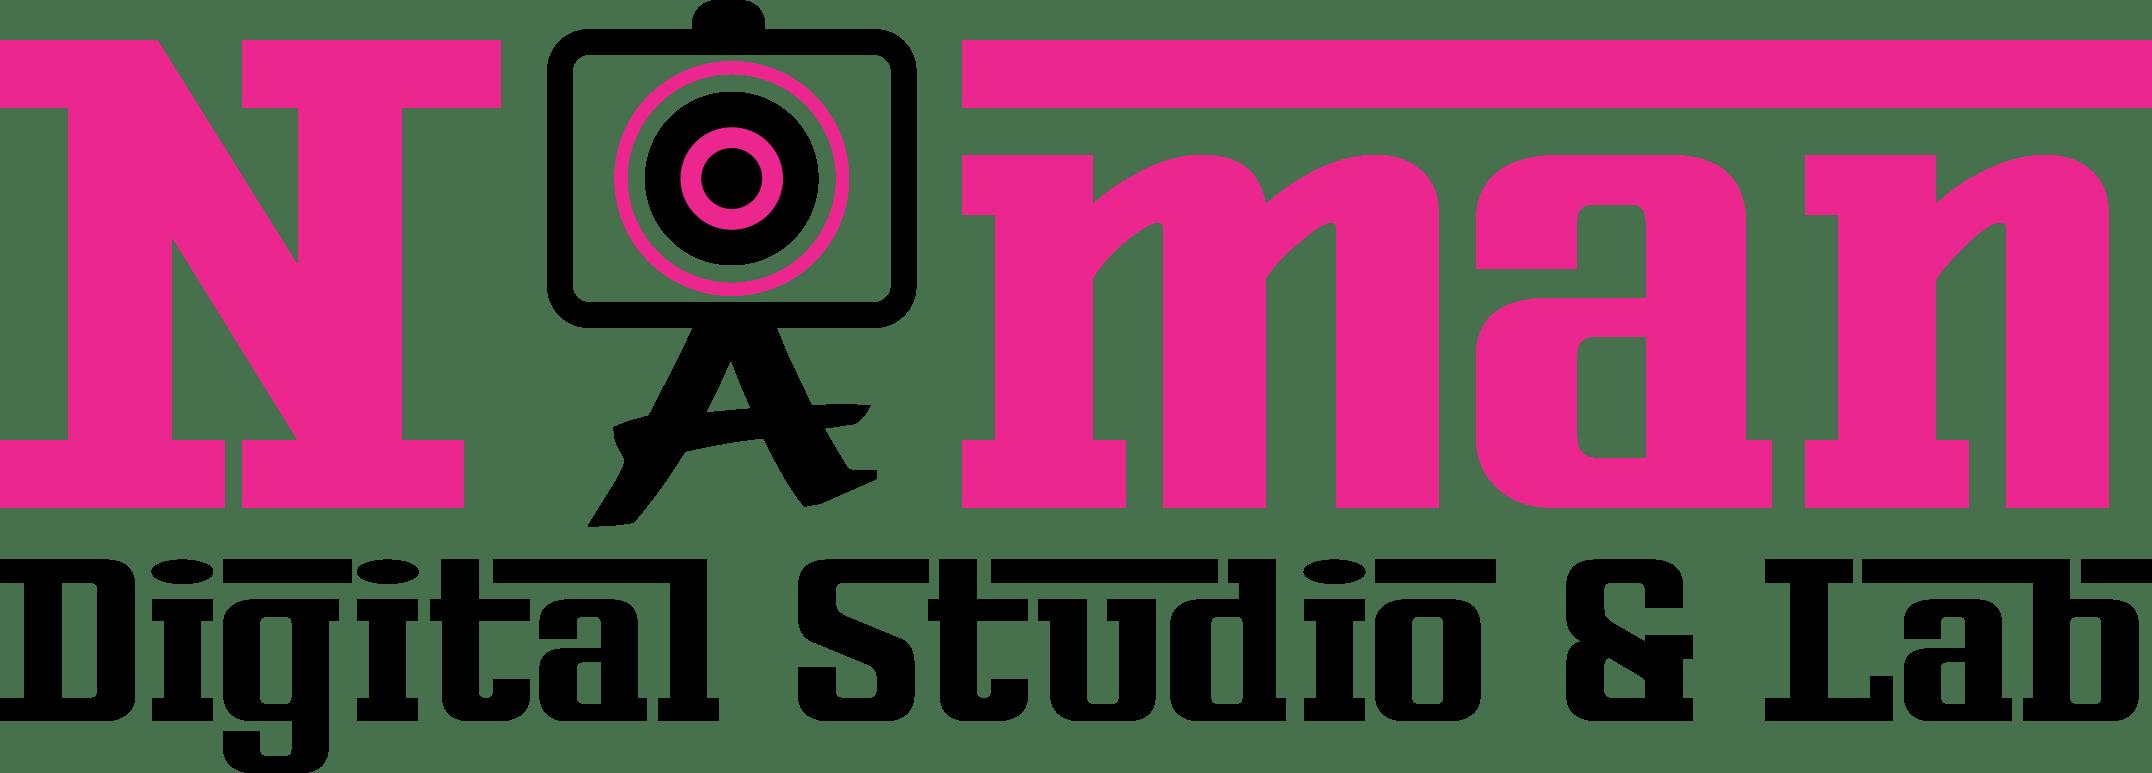 Naman Digital Studio & Lab